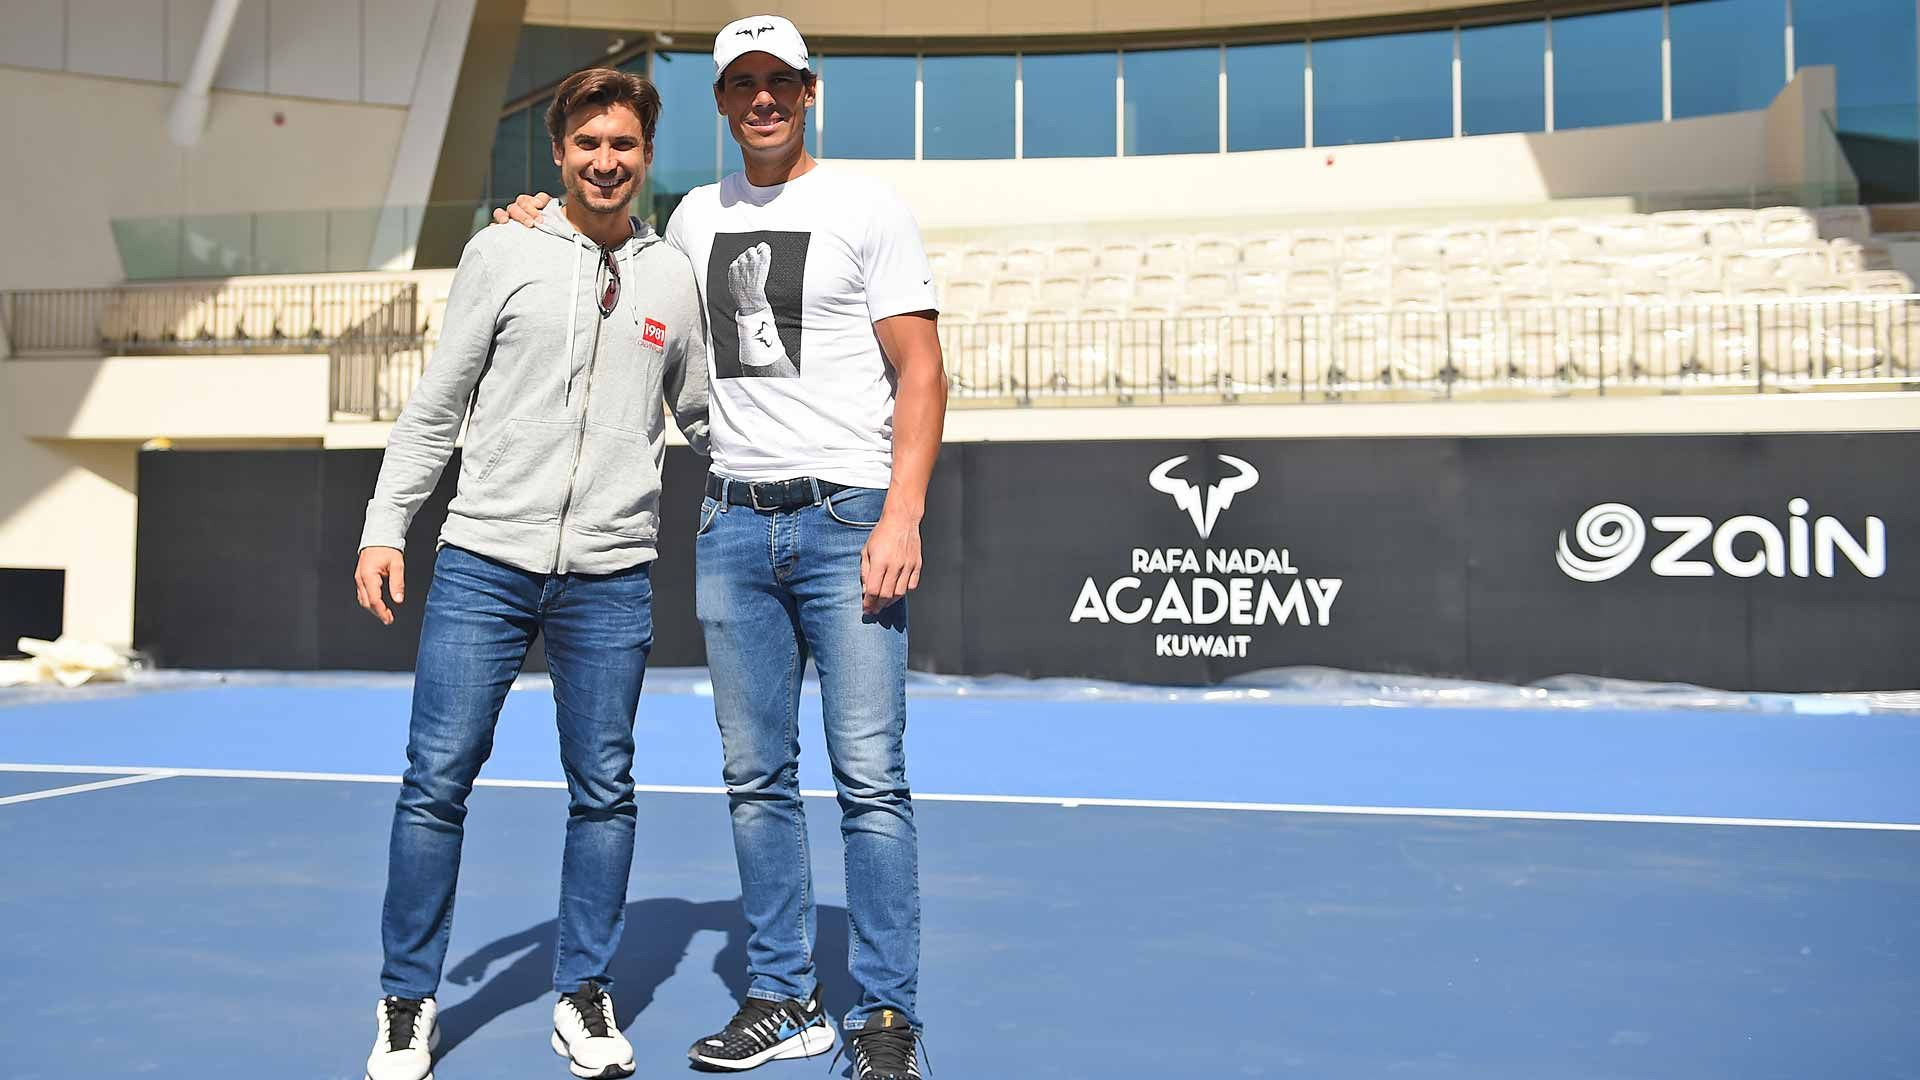 Rafael Nadal David Ferrer Inaugurate The Rafa Nadal Academy Kuwait Atp Tour Tennis The Rafa Nadal Academy Kuwait Is In 2020 Rafa Nadal Rafael Nadal Academy